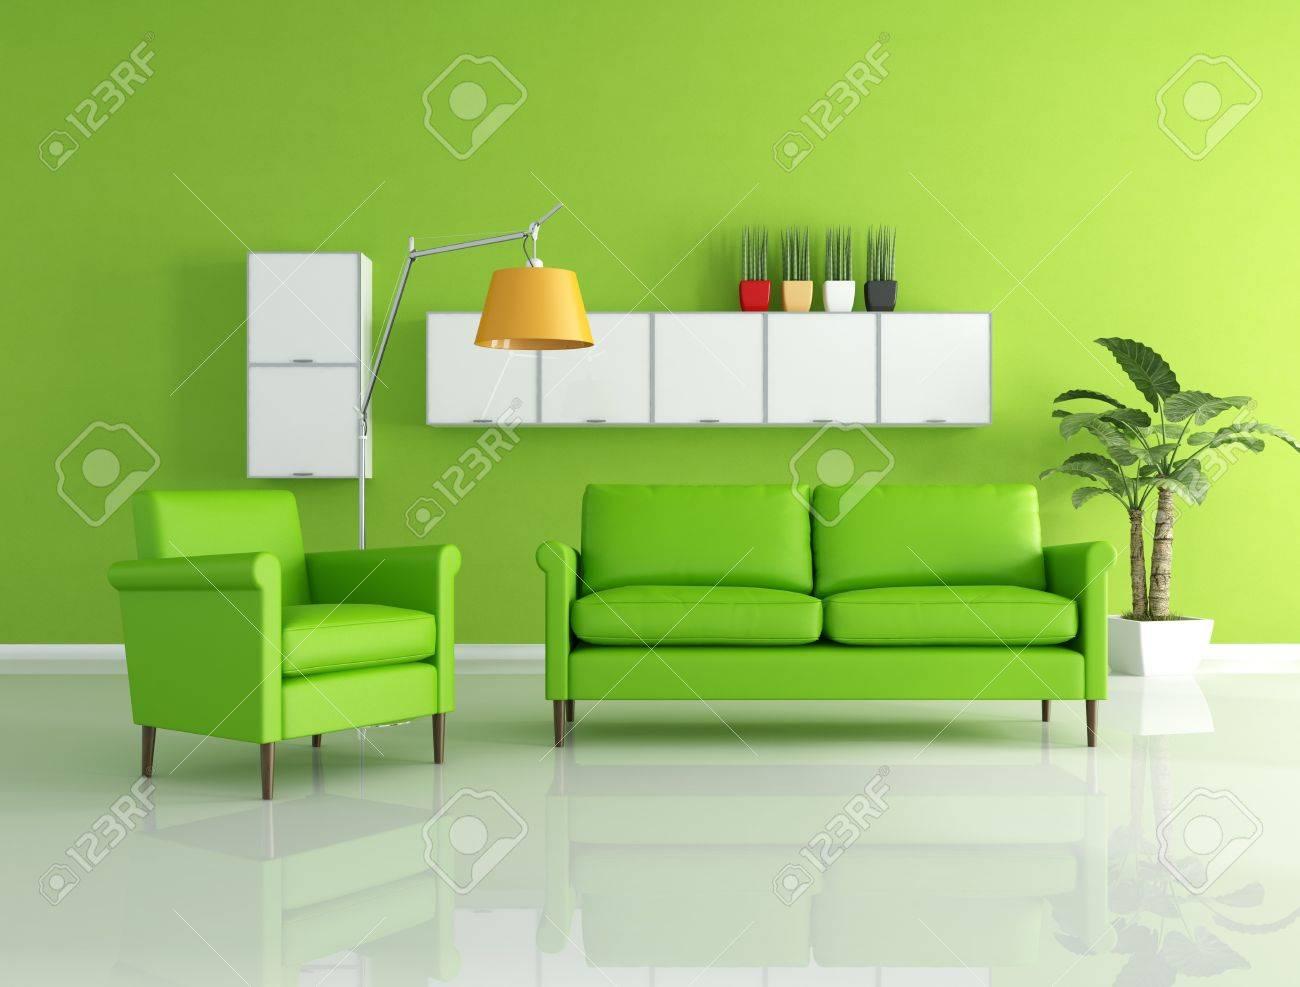 Groene bank en fauteuil in een moderne woonkamer royalty vrije ...